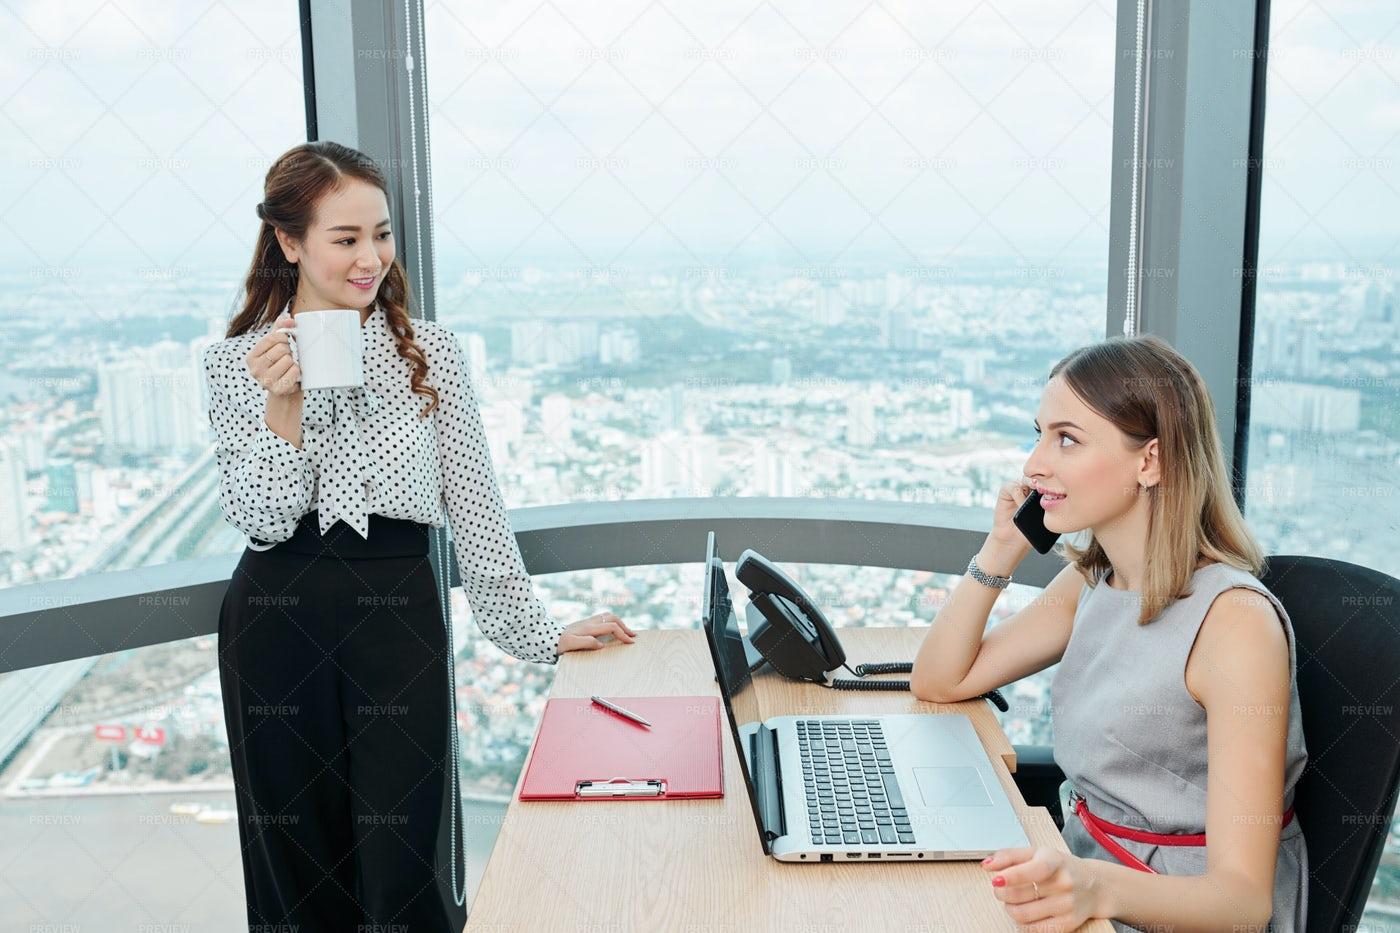 Businesswomen Working In Office: Stock Photos